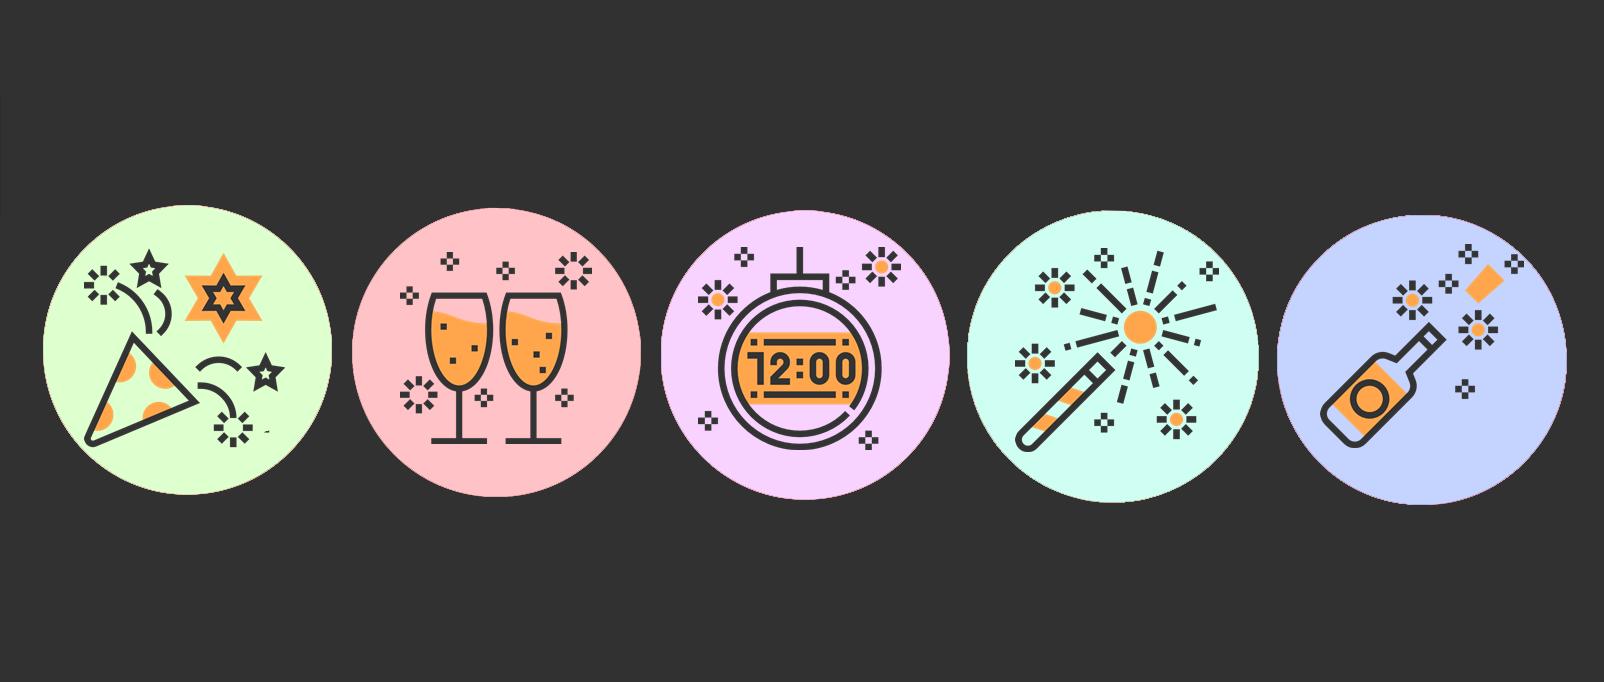 noche-vieja-villa-retiro-año-nuevo-fin de año villa retiro